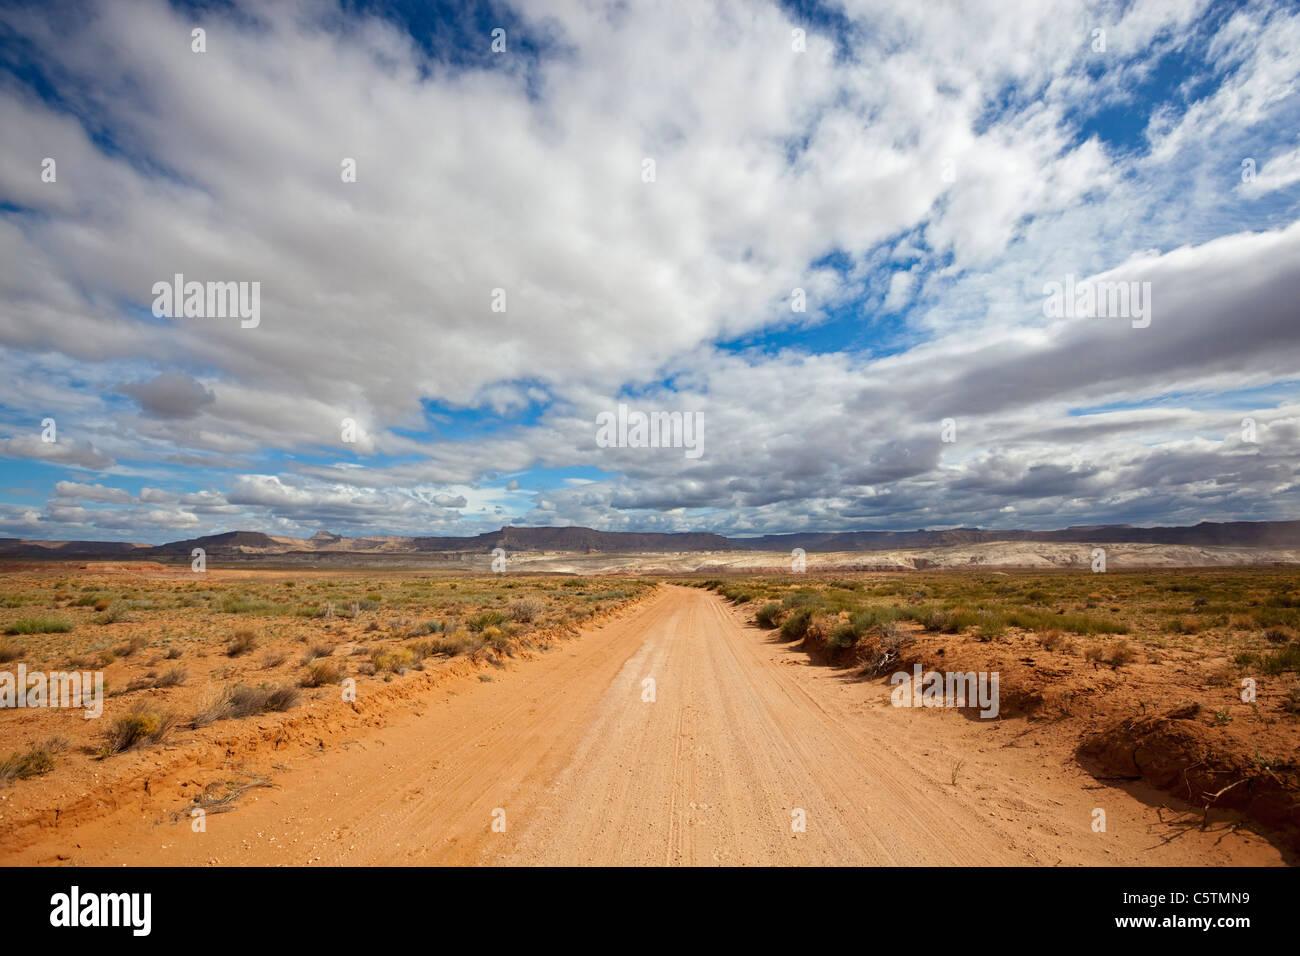 USA, Utah, Deserted sand track - Stock Image